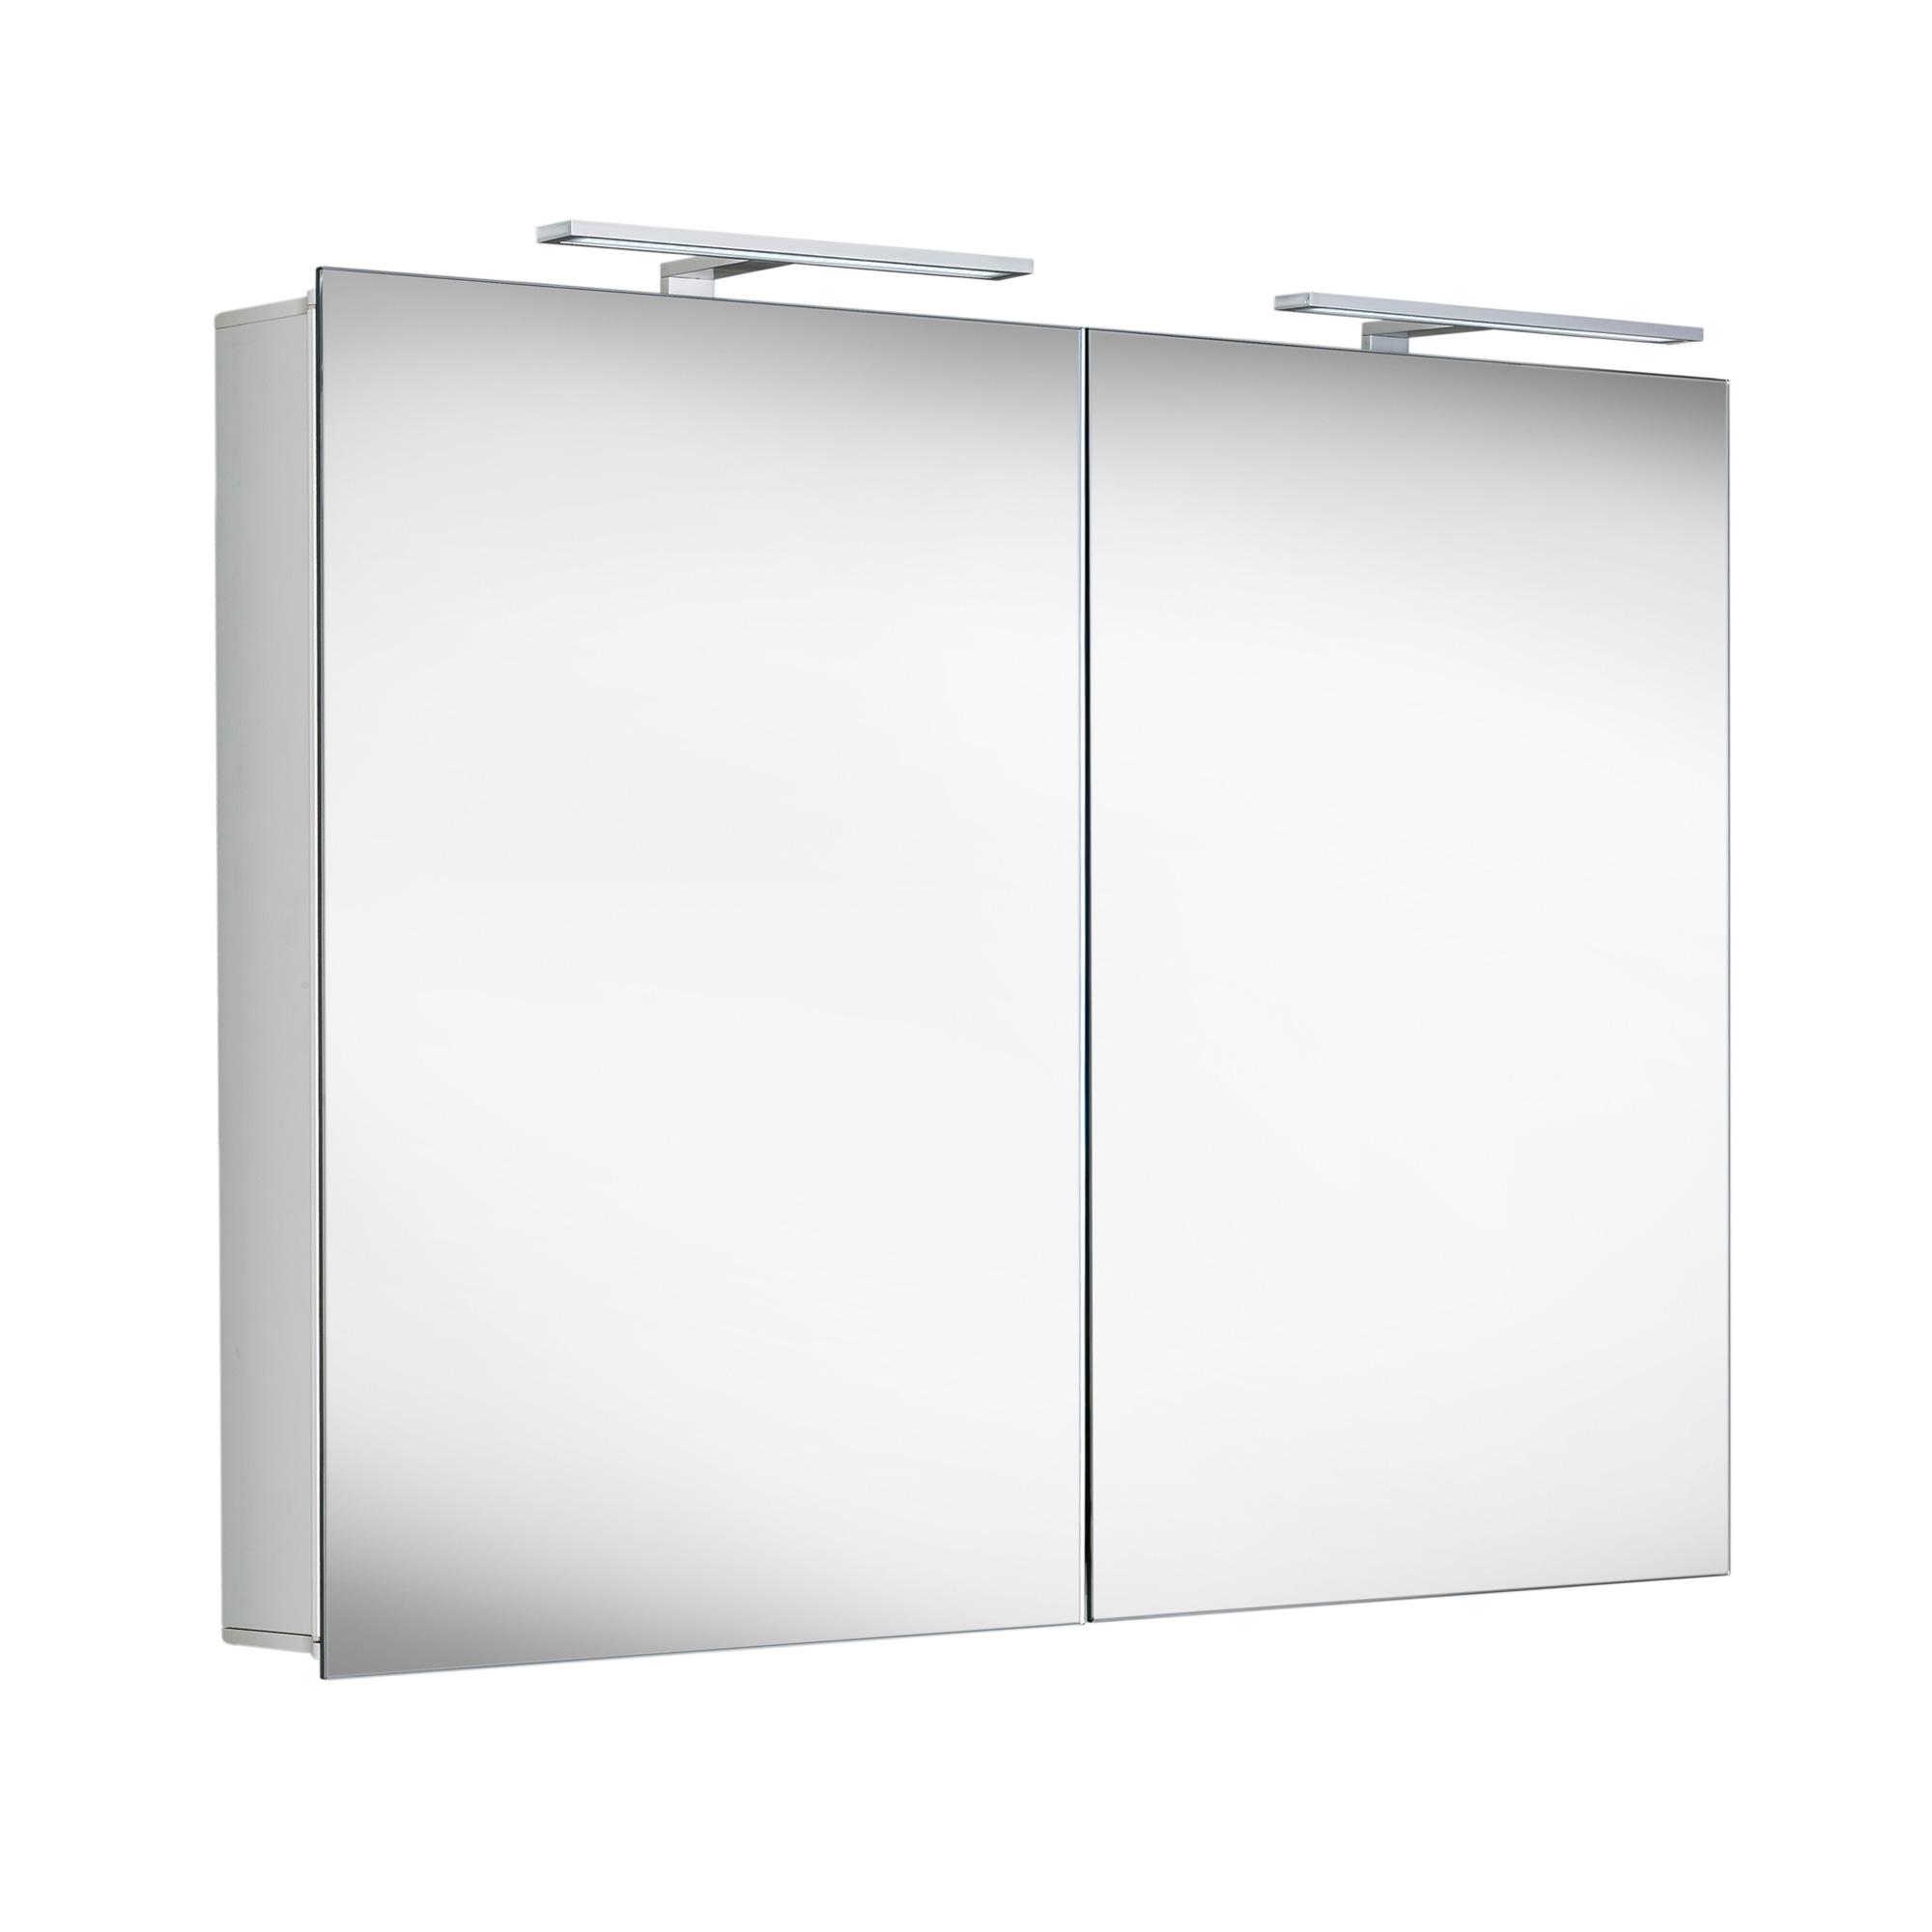 matedo entry sps spiegelschrank b 100 h 70 t 12 cm mit. Black Bedroom Furniture Sets. Home Design Ideas